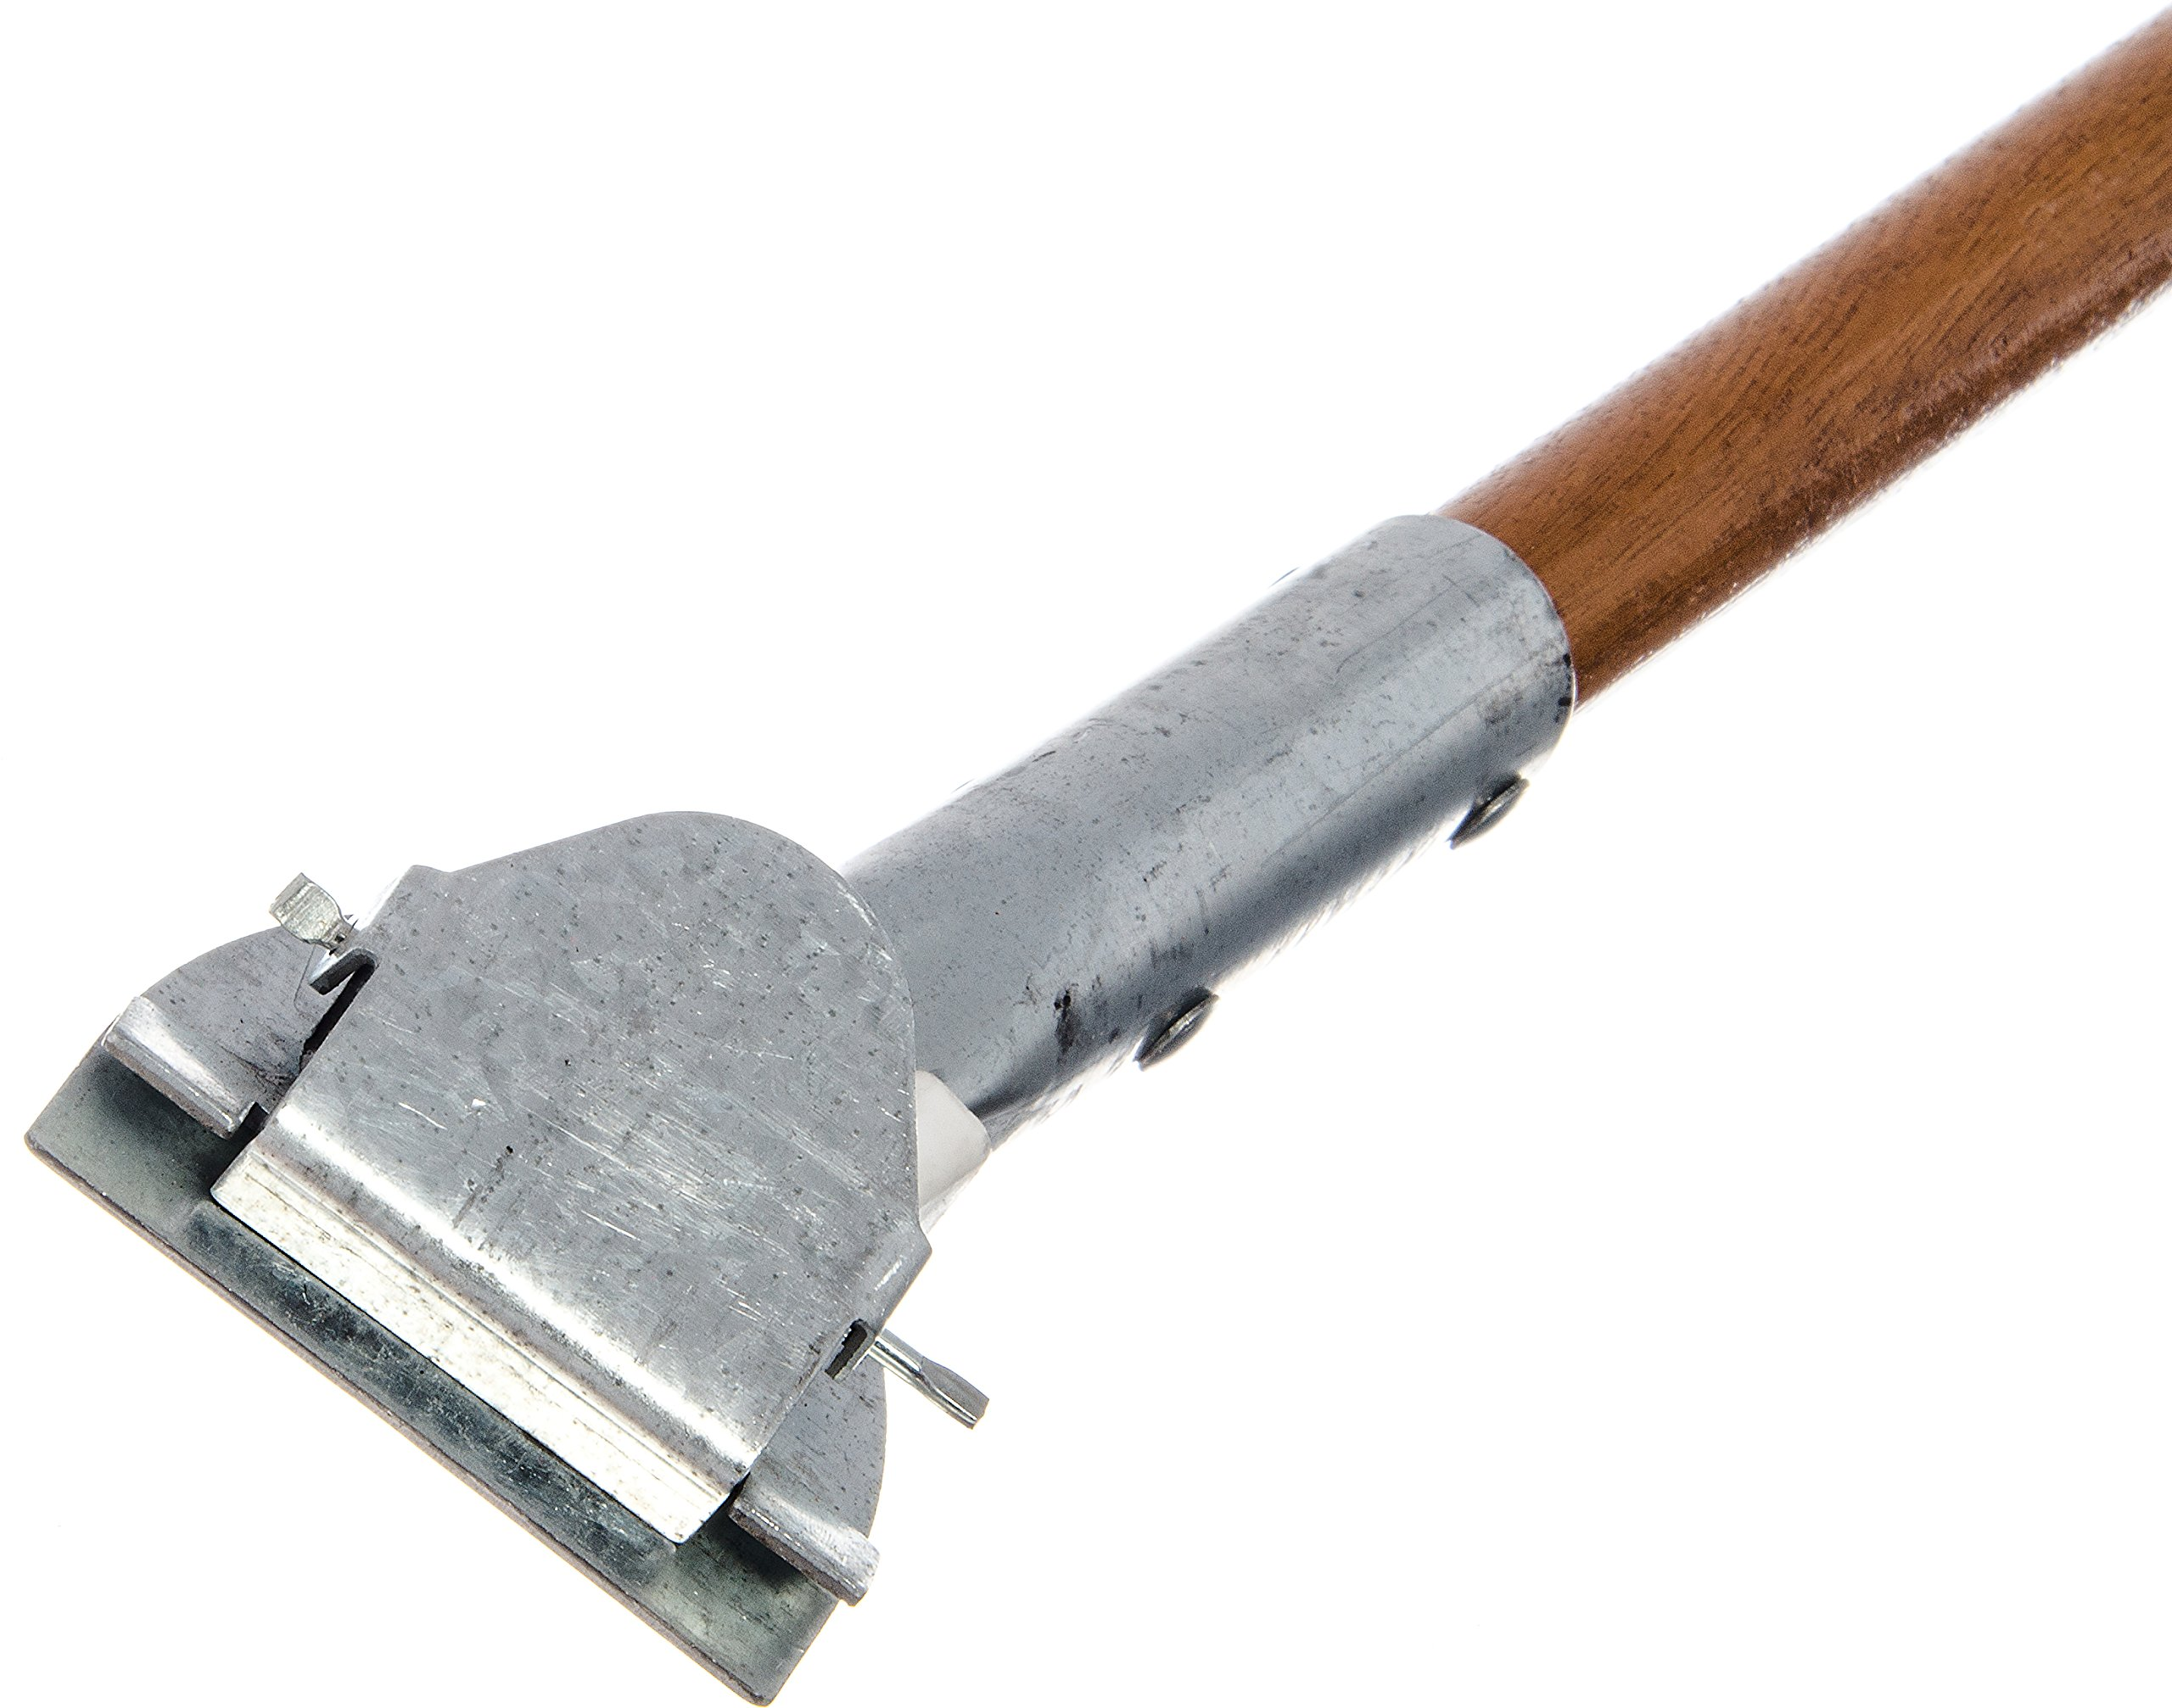 Carlisle 4585000 Wood Dust Mop Handle, 15/16'' Diameter x 60'' Length (Pack of 12) by Carlisle (Image #2)